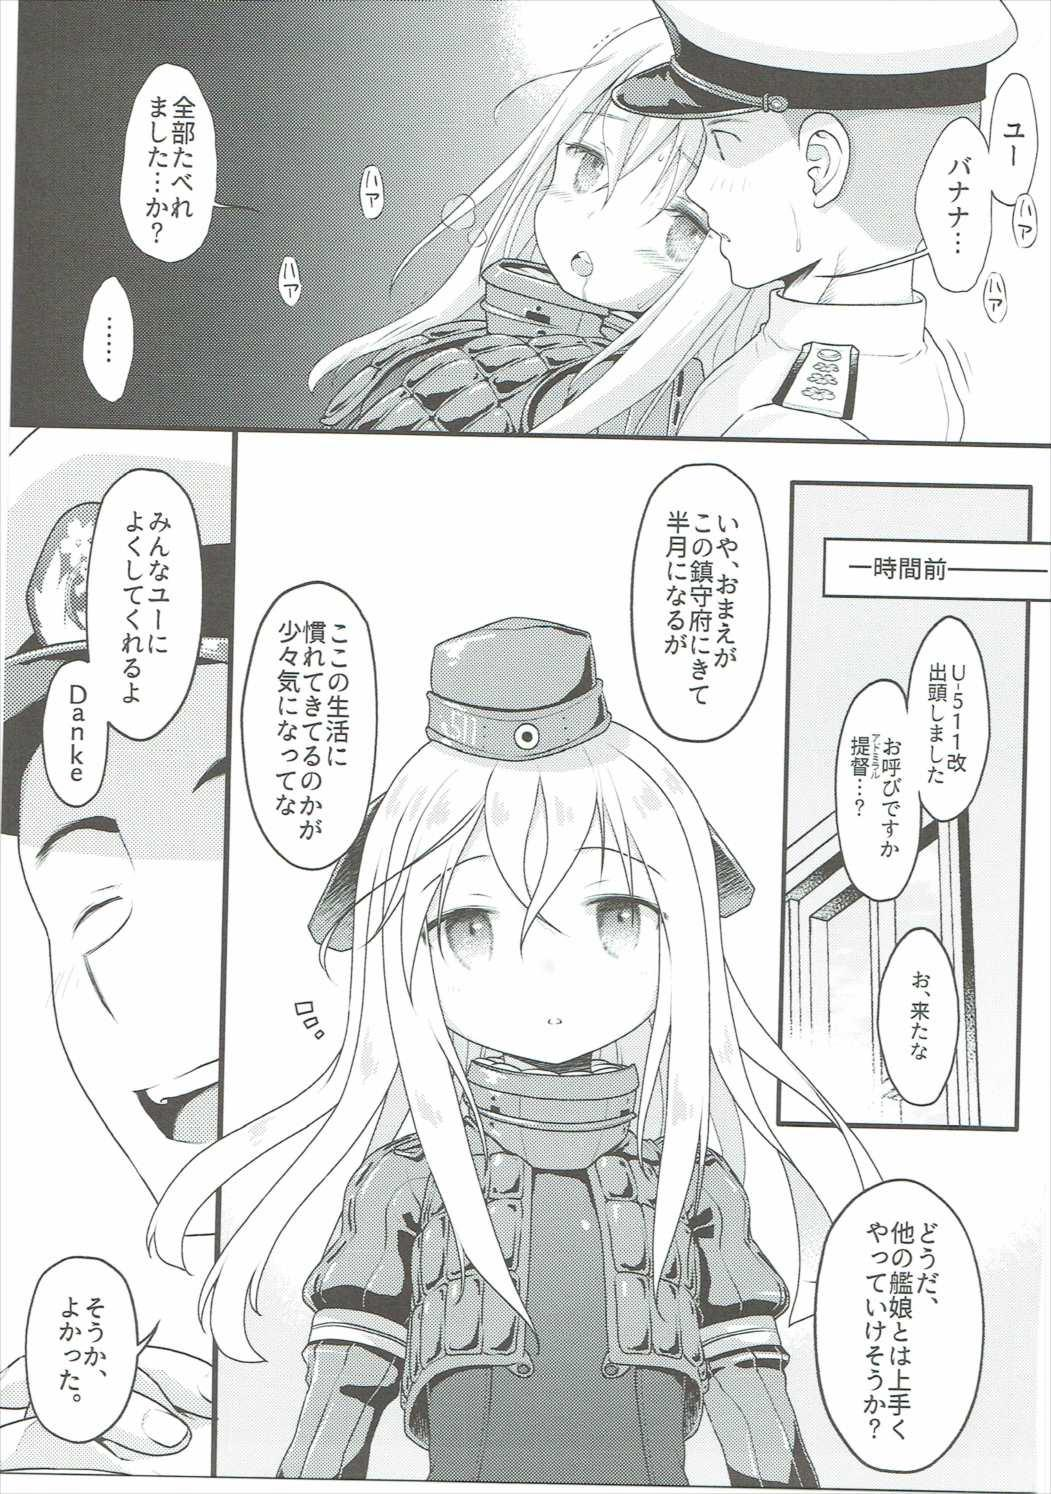 U-boat de BANANA Boat 3